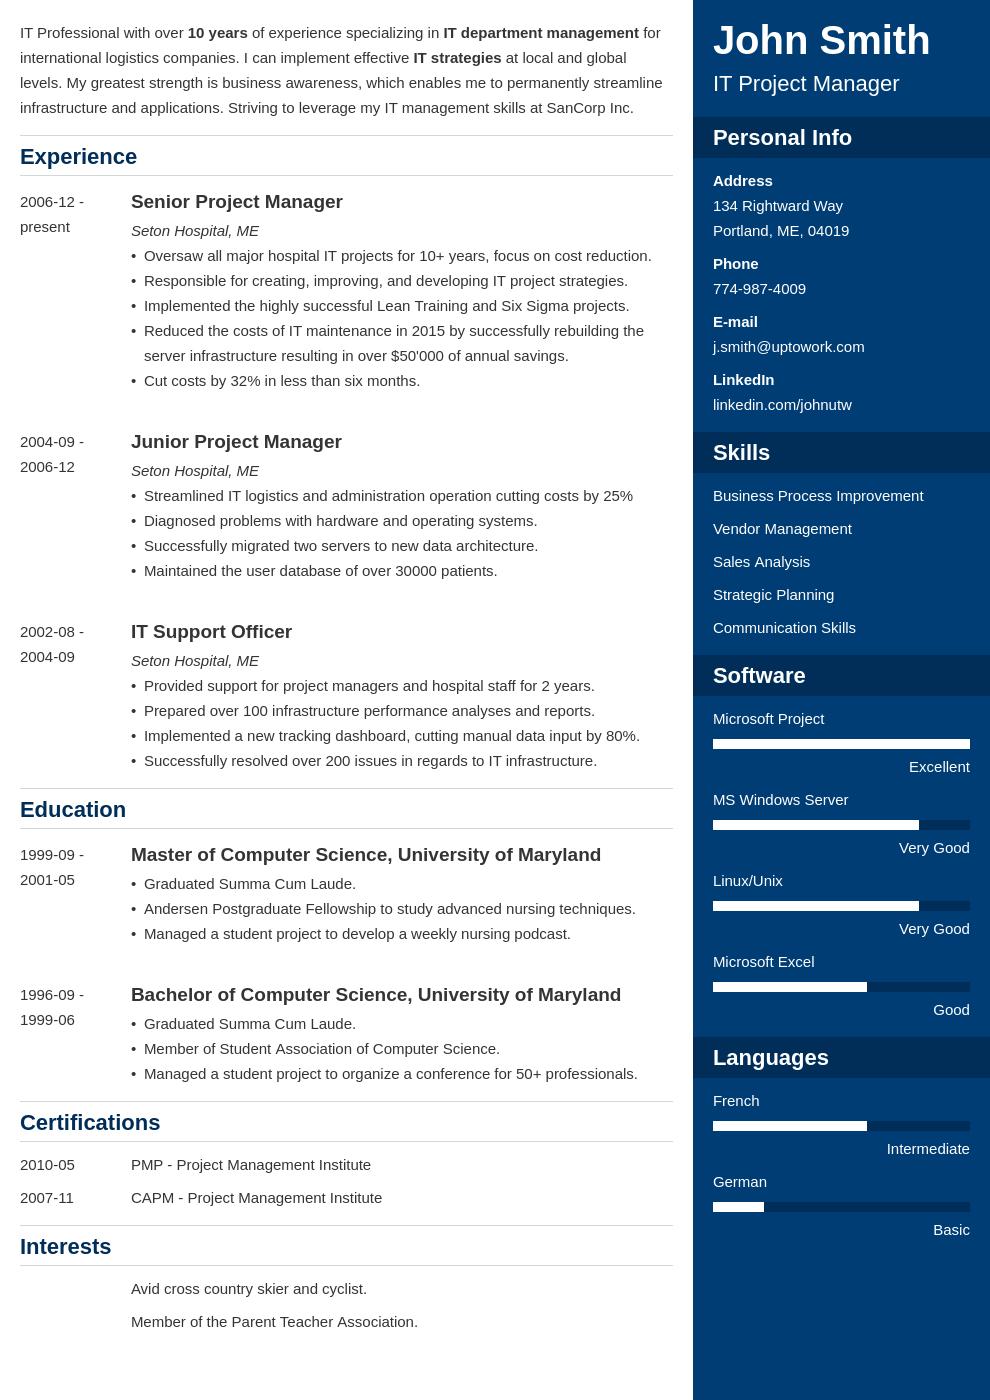 CV Template Enfold